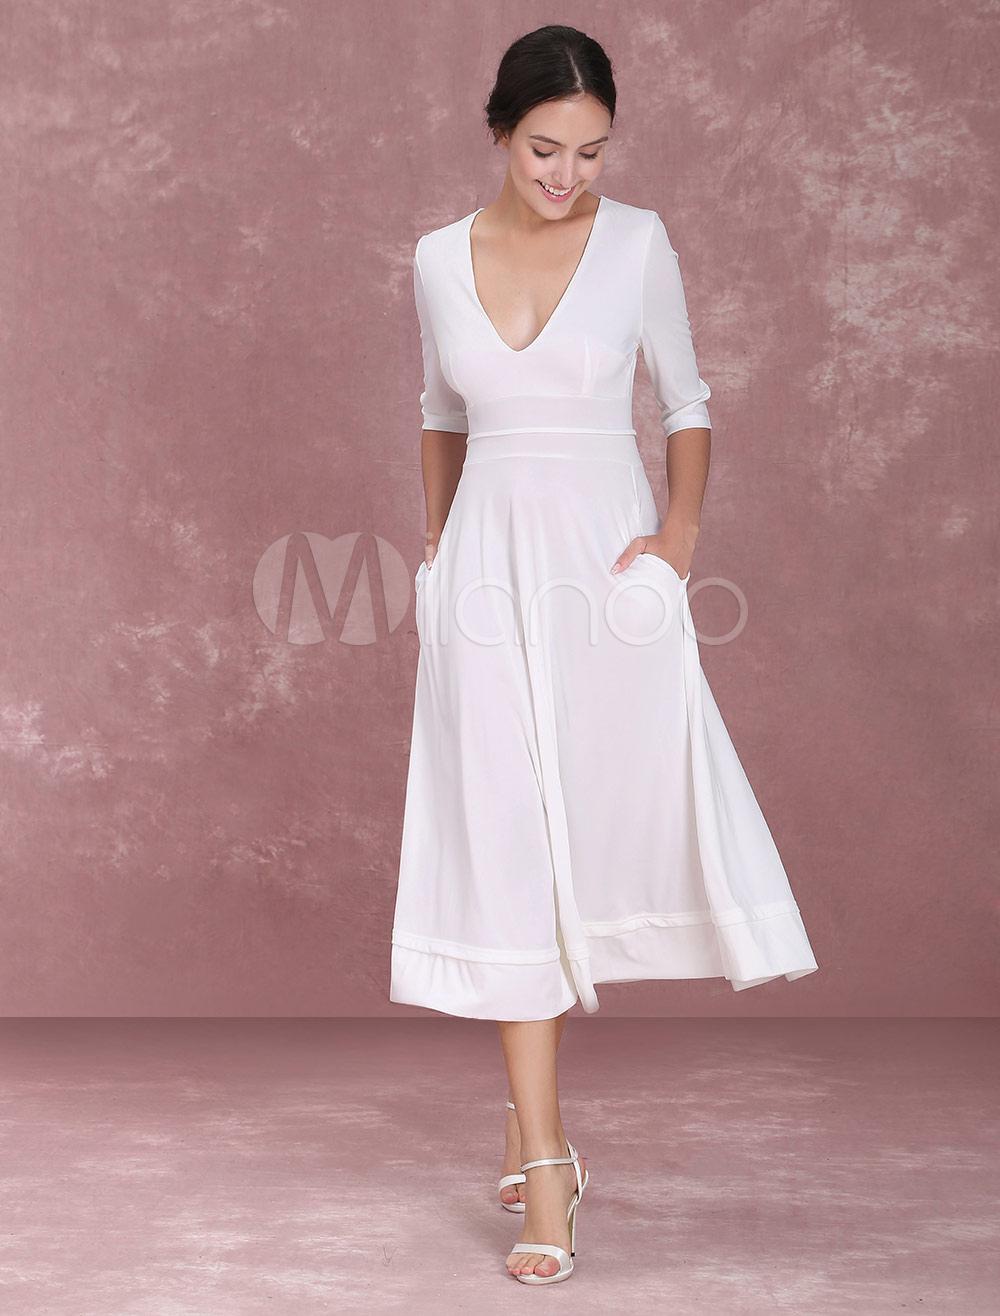 Vintage Skater Dress White Plunging Neckline Short Sleeve Pleated Fit Flare Dress (Women\\'s Clothing Skater Dresses) photo